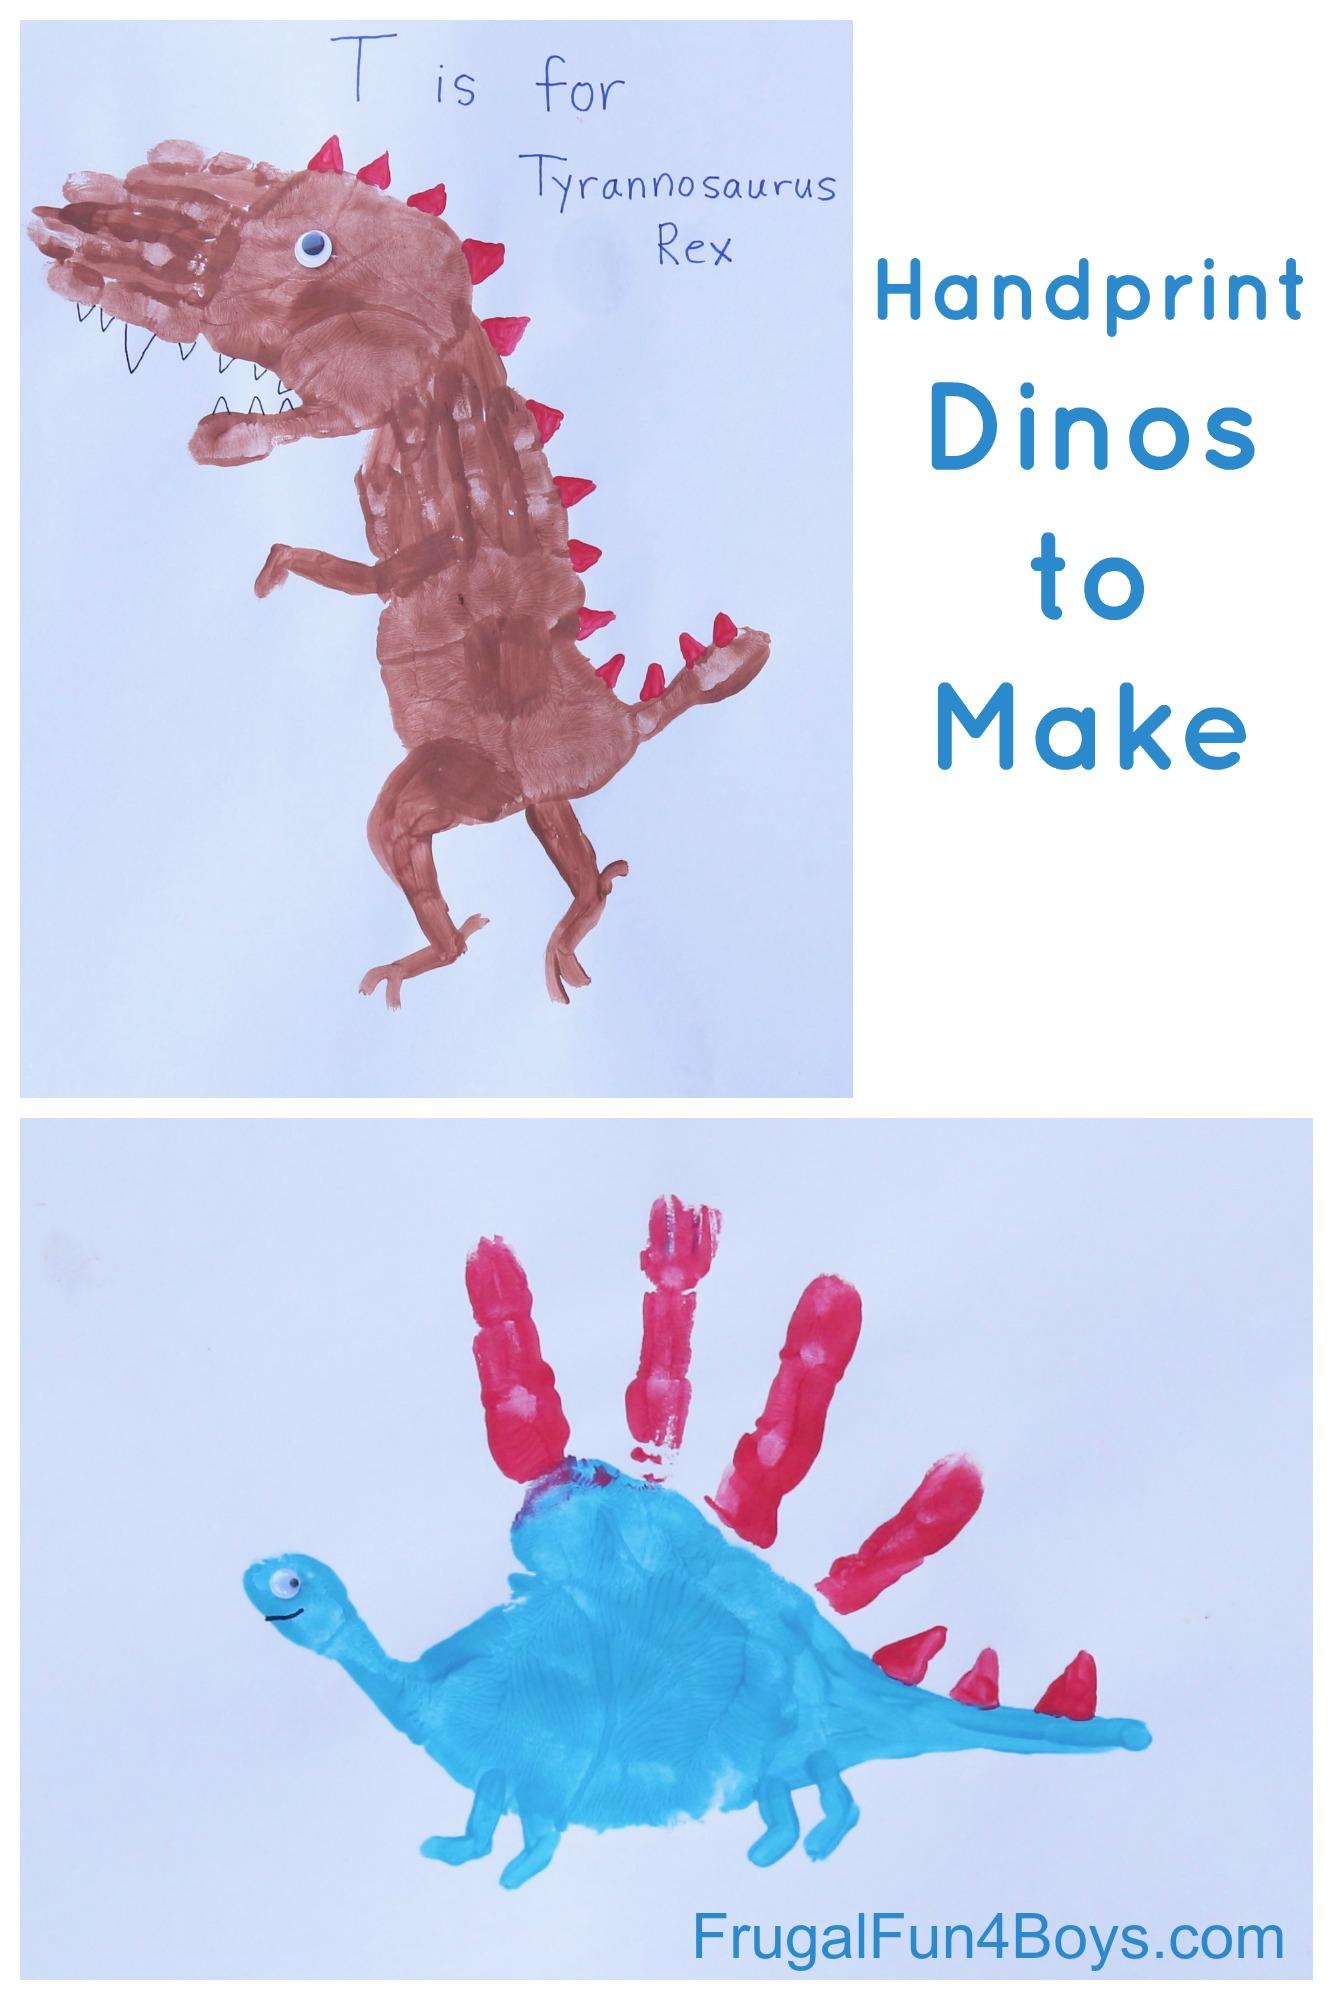 Dinosaur Craft for Kids: Handprint T-Rex, Stegosaurus, and Brachiosaurus